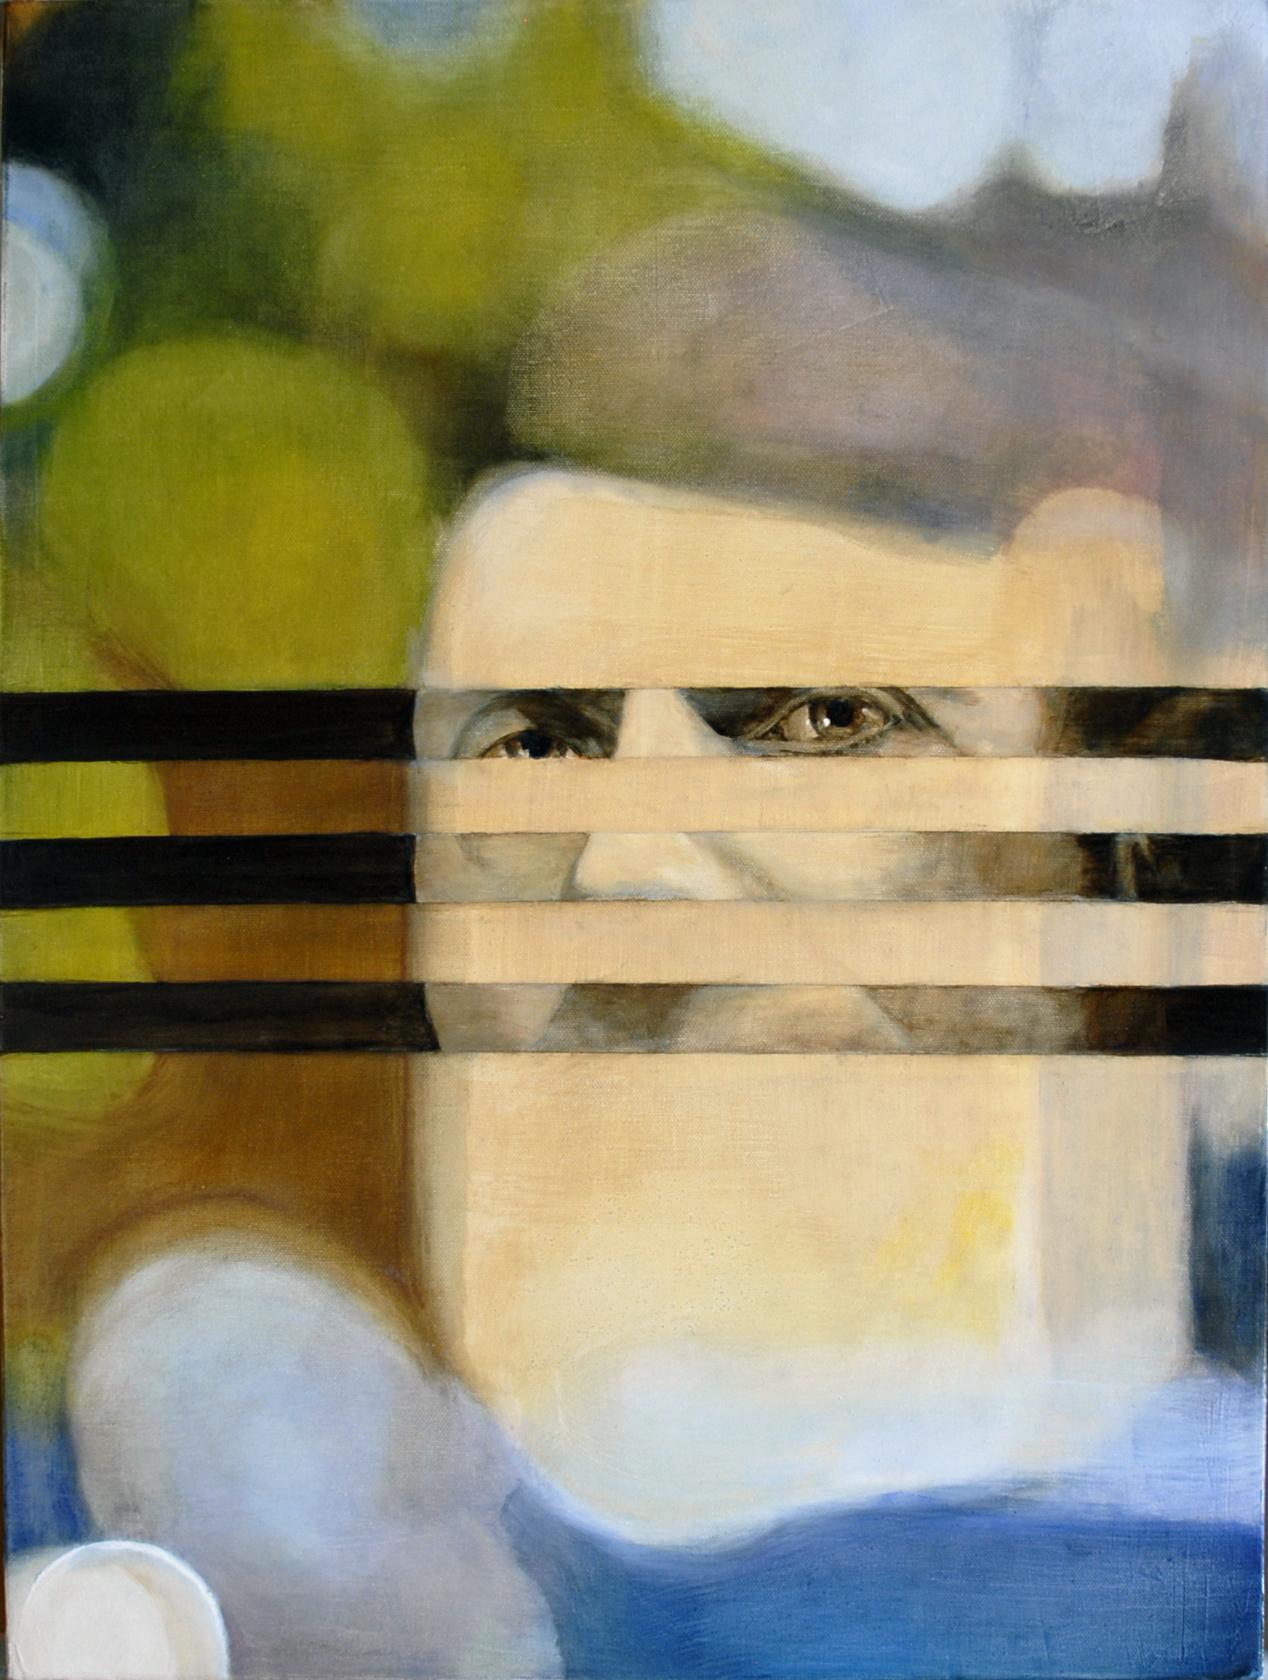 "Cocoon. Paul XO Pinkman. 2015. Oil on canvas. 24"" h x 18"" w"